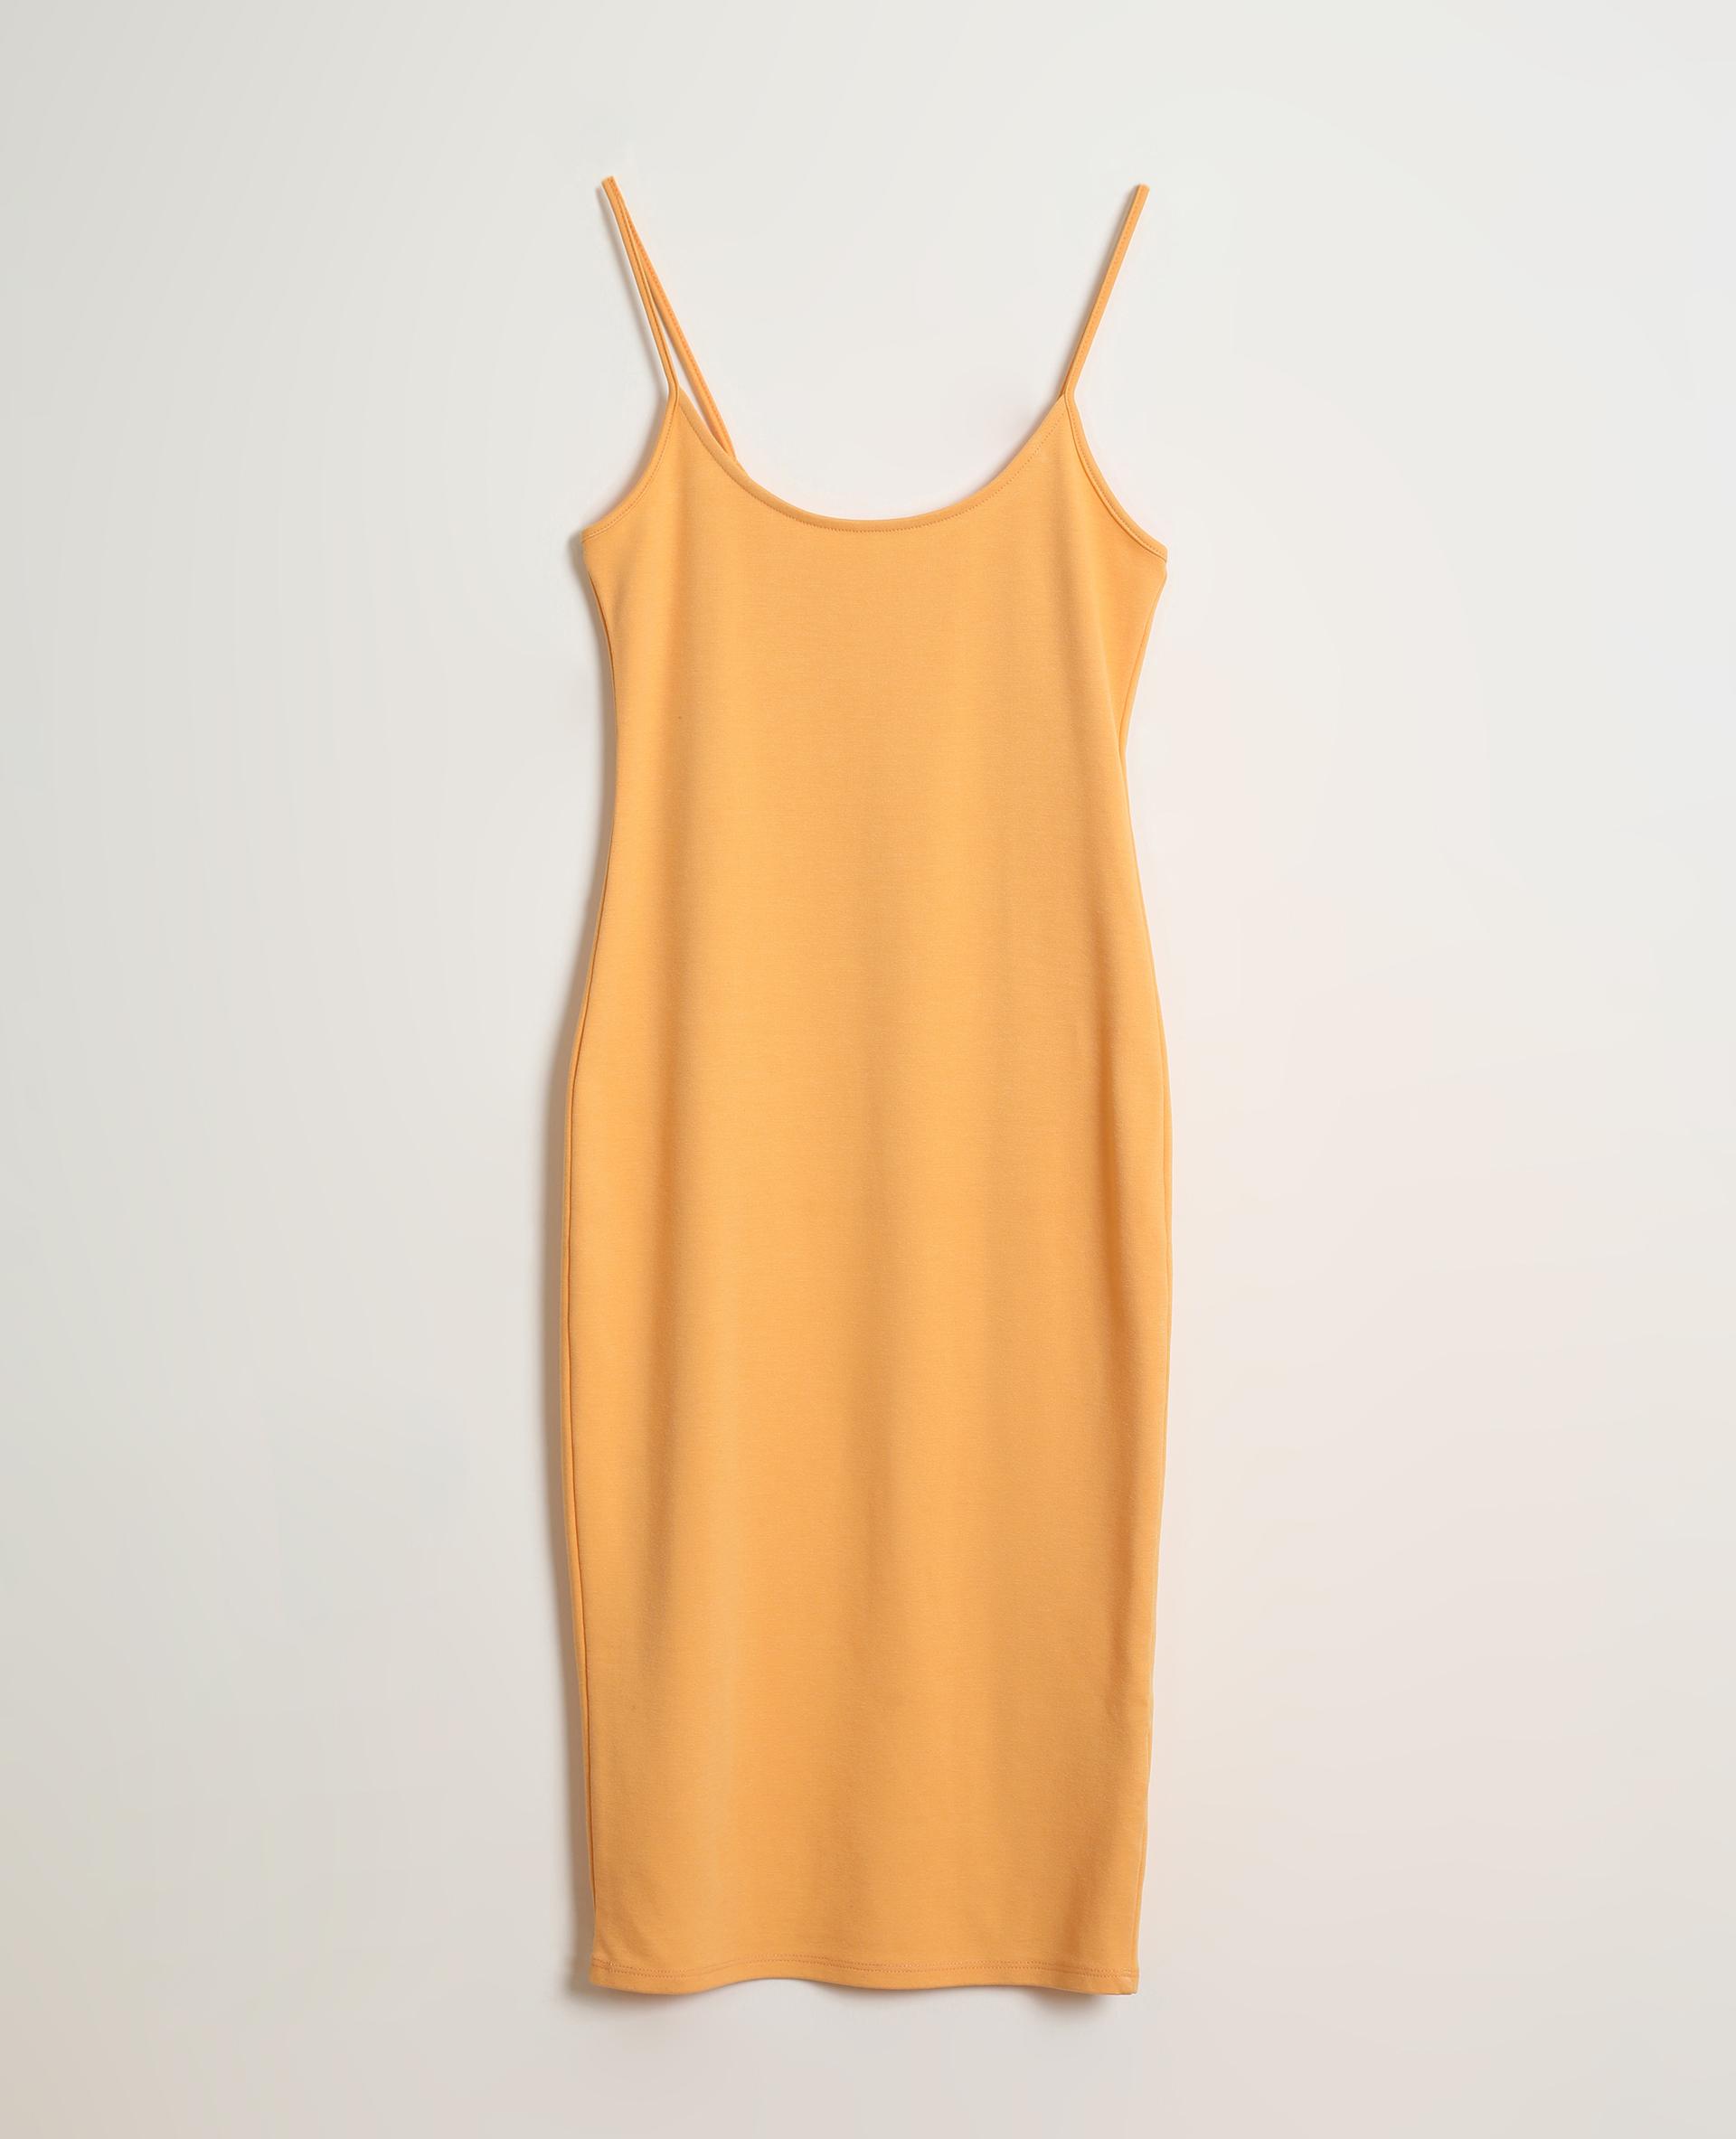 Robe moulante orange - Pimkie